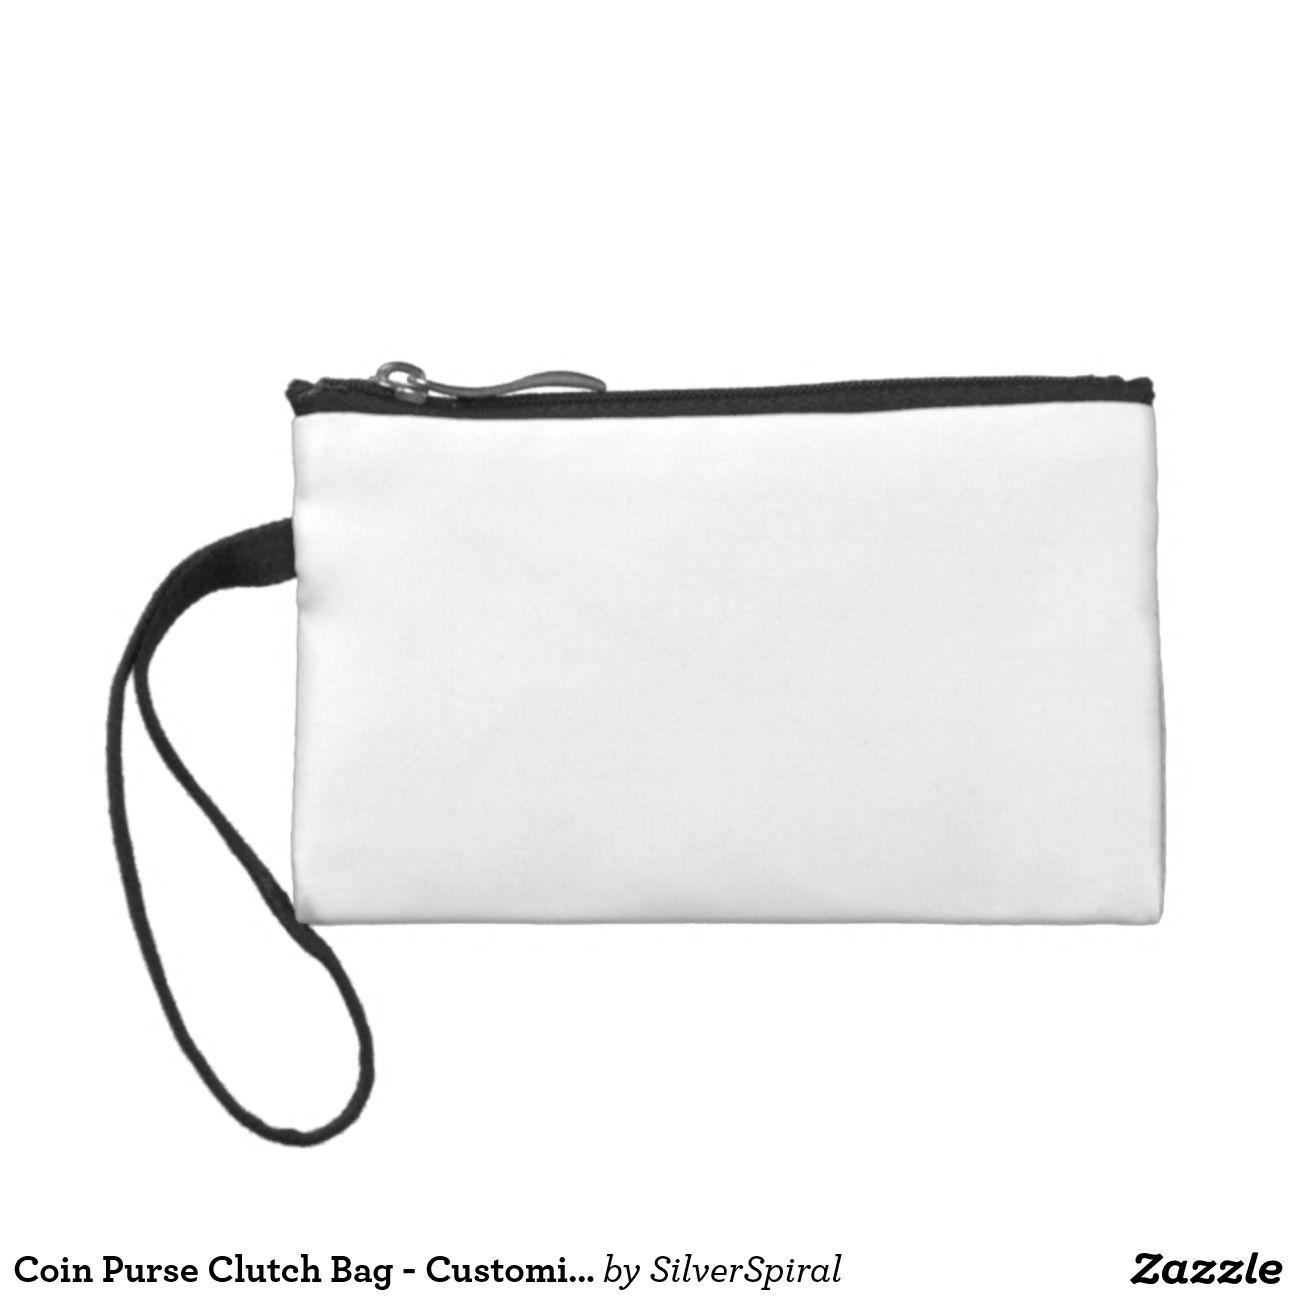 coin purse clutch bag customized template blank art fabric